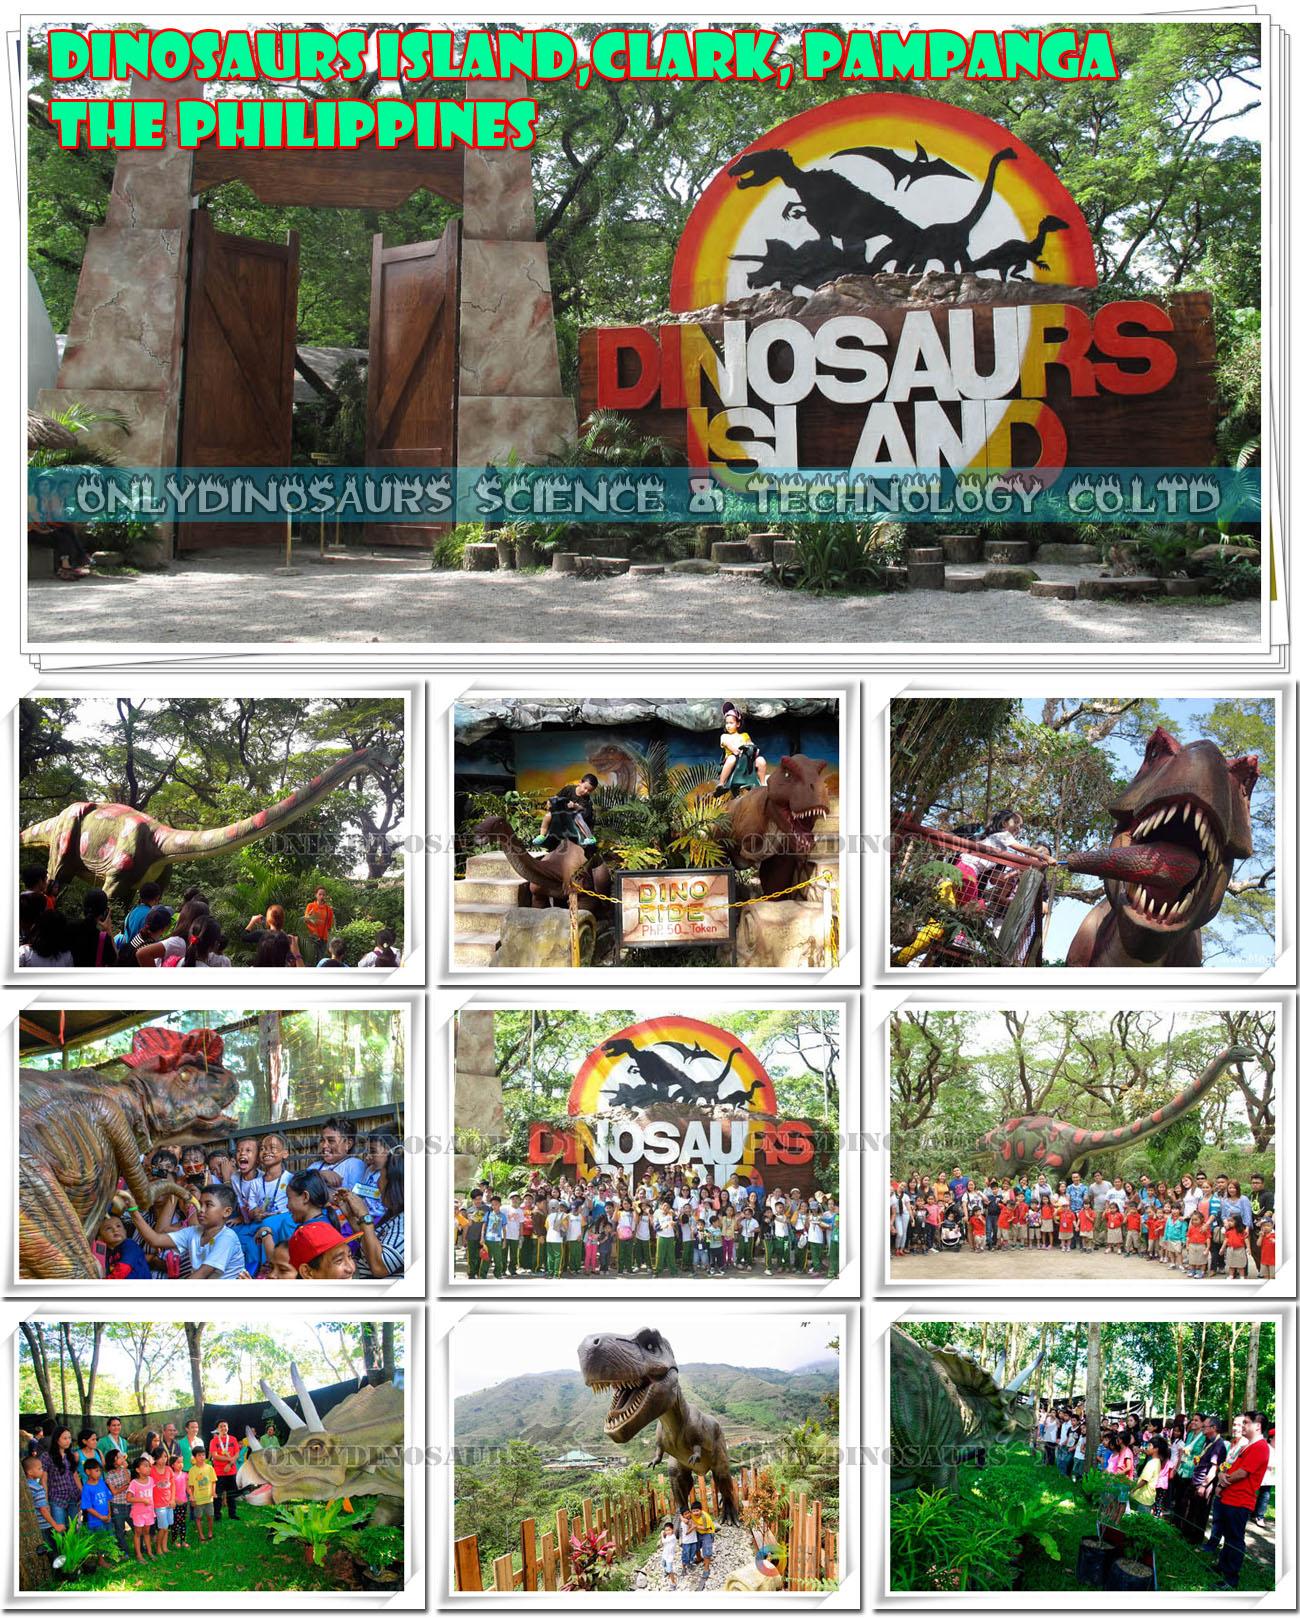 Dinosaurs Island in Philippines